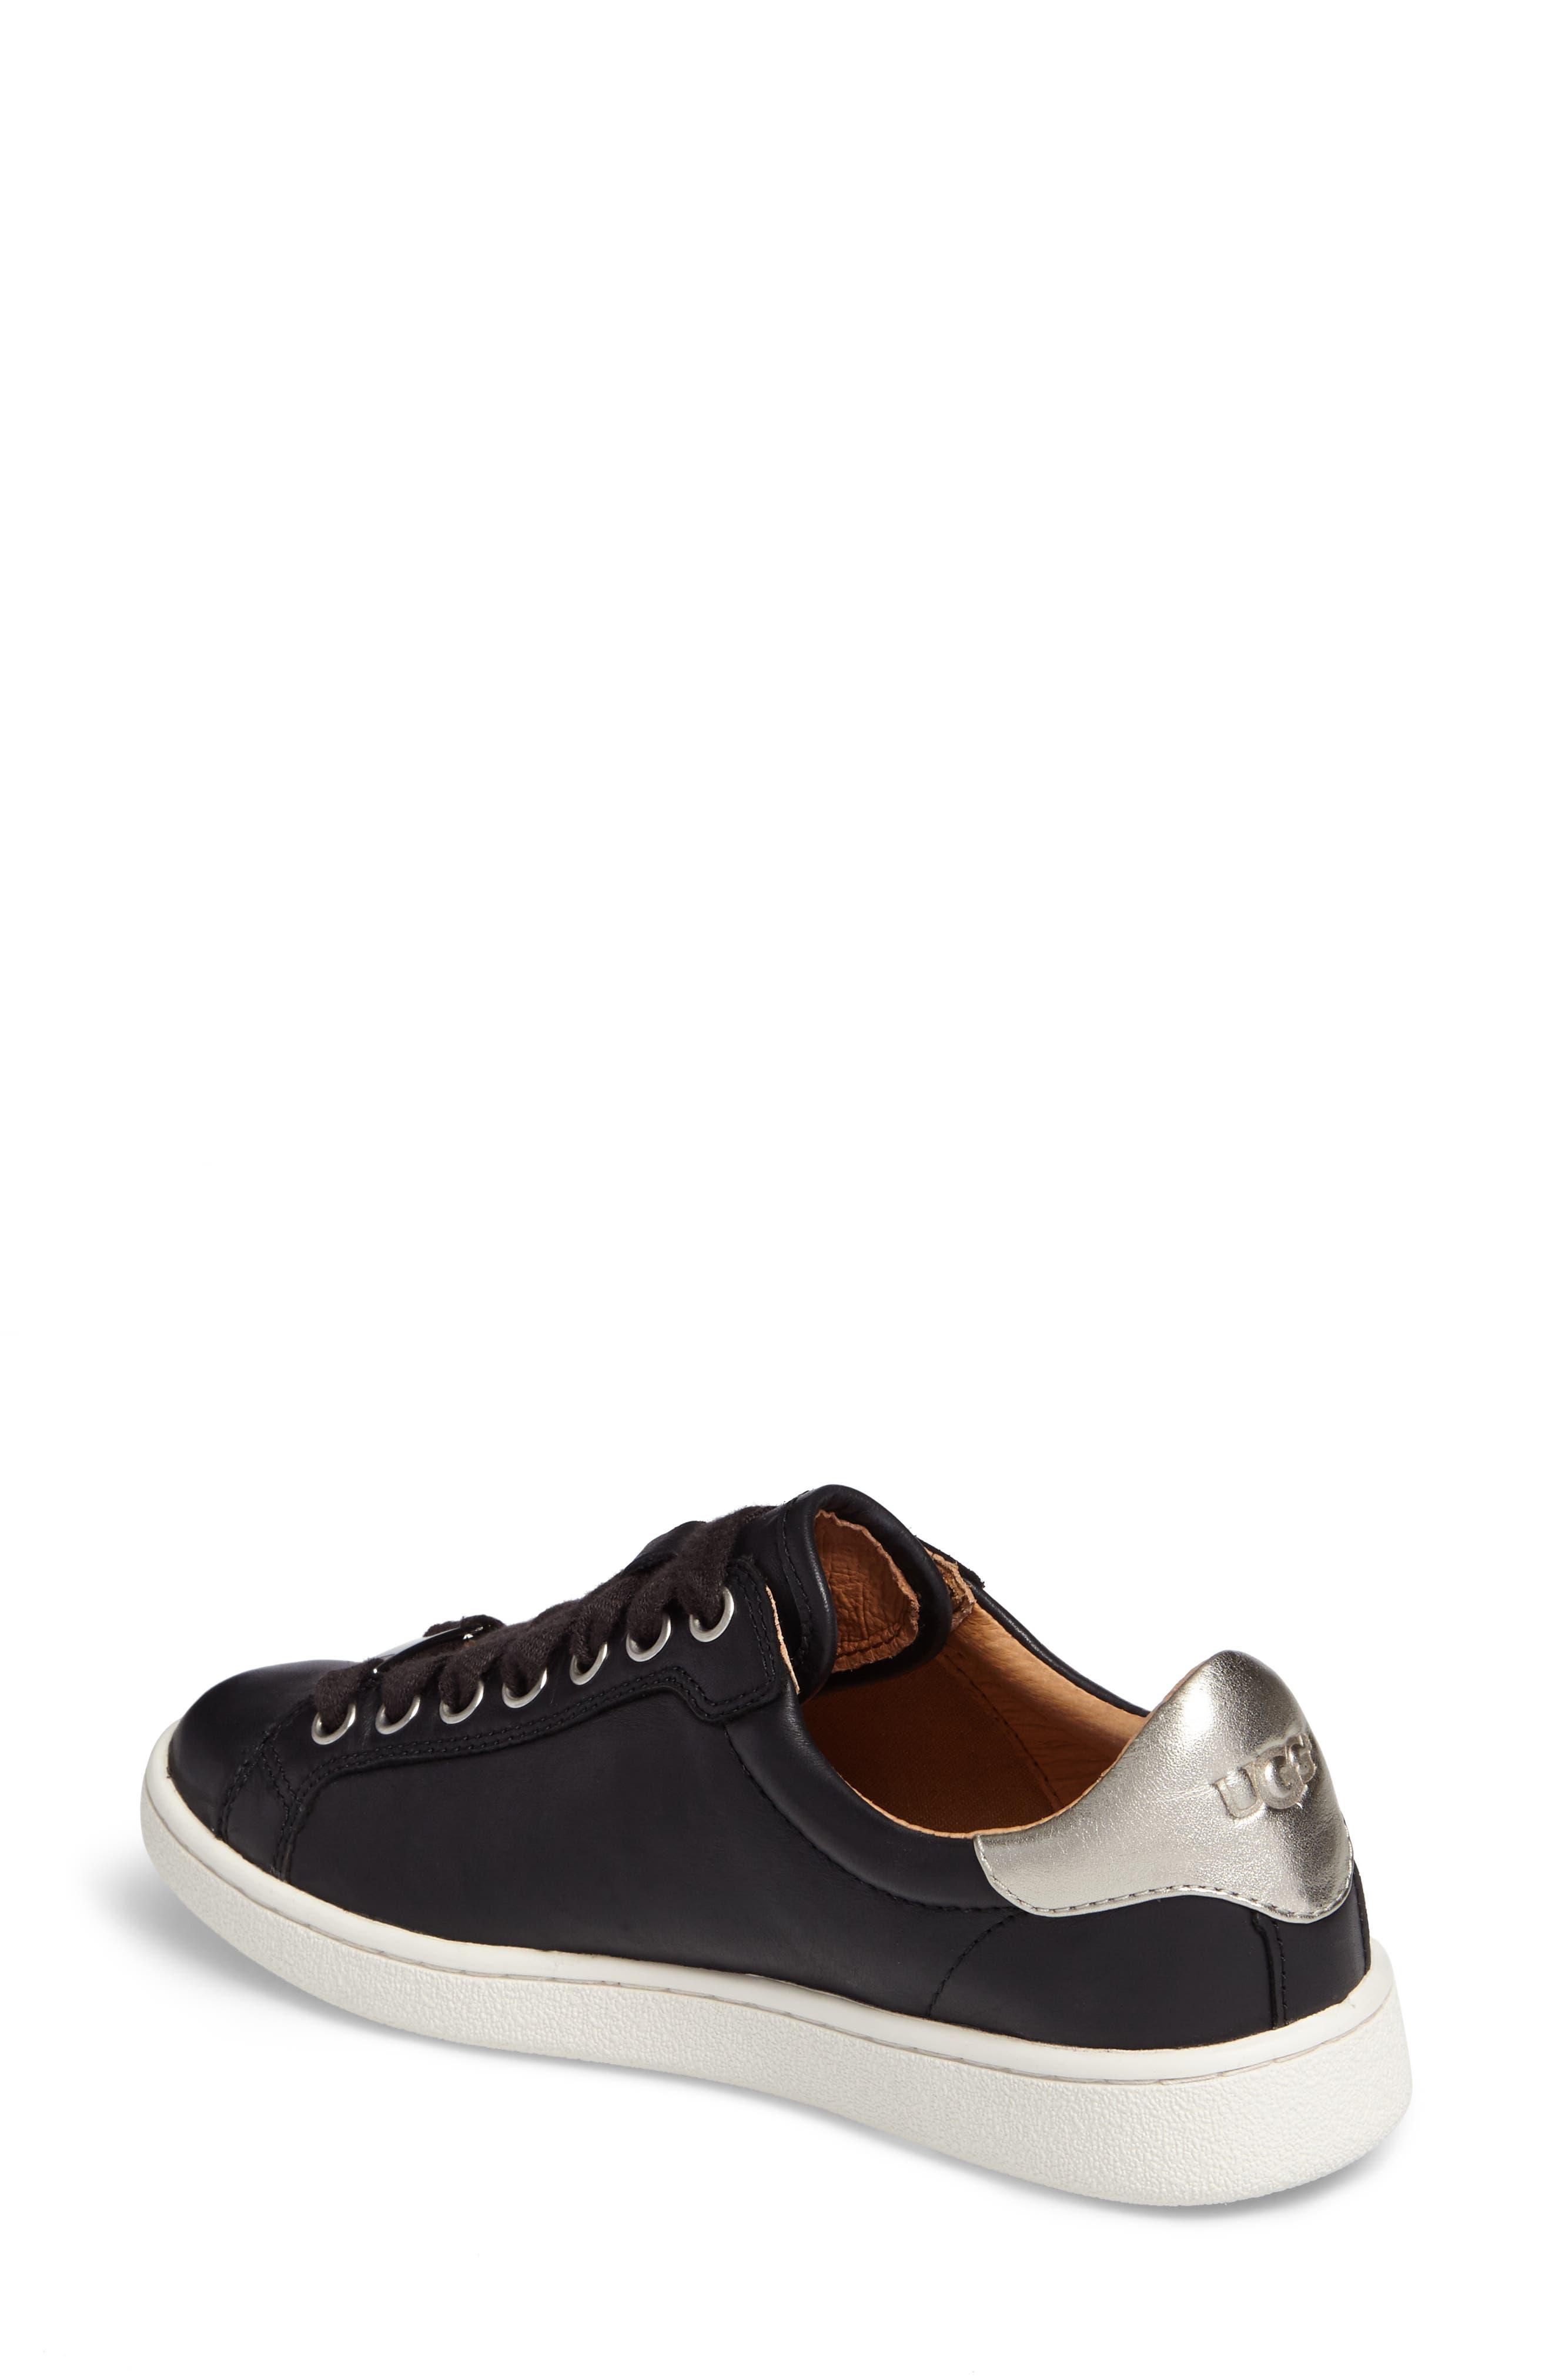 Milo Sneaker,                             Alternate thumbnail 2, color,                             BLACK LEATHER